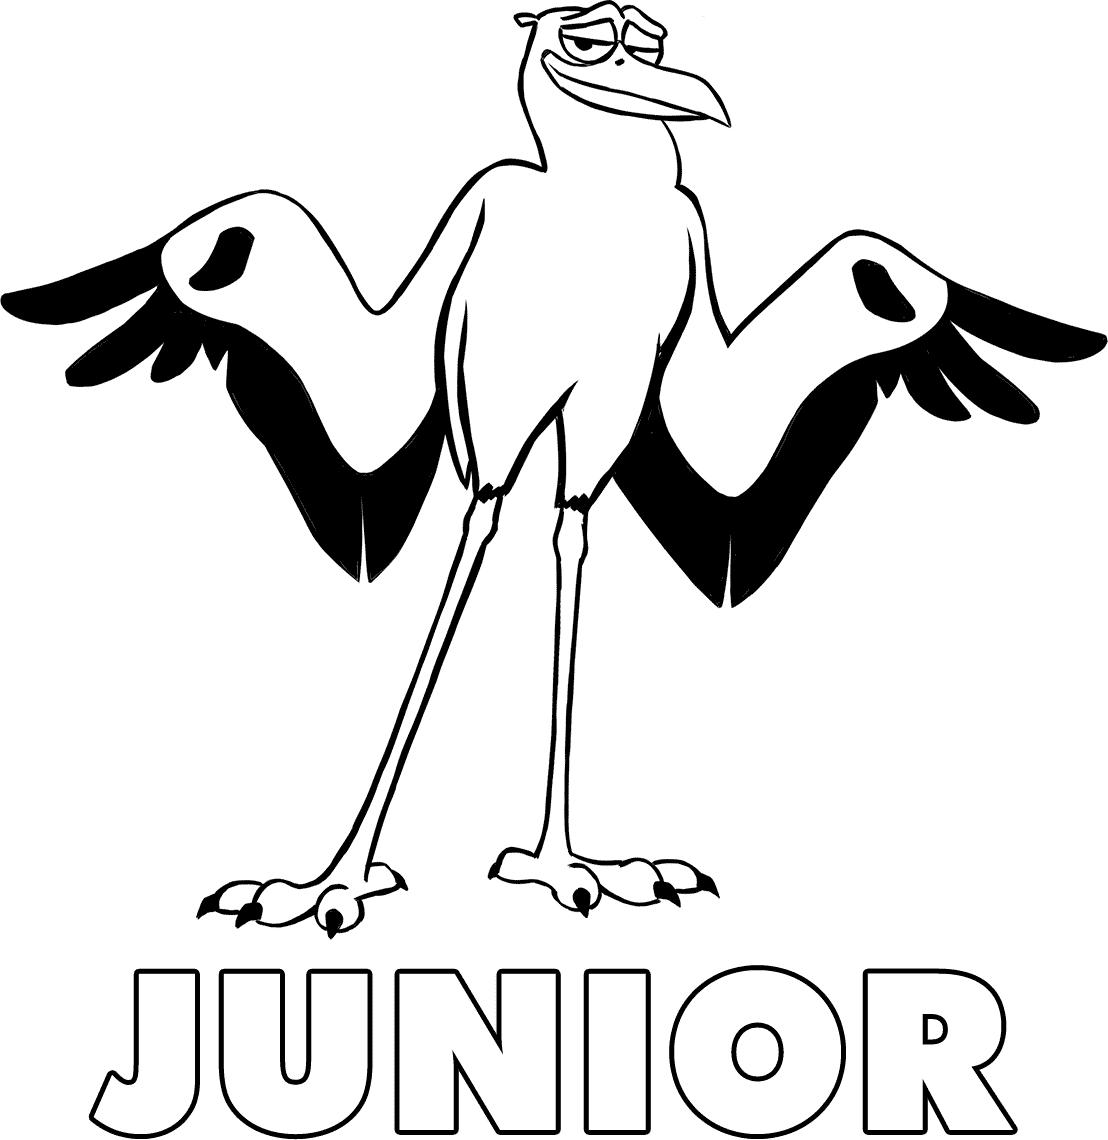 Junior, de Cegonhas, para colorir